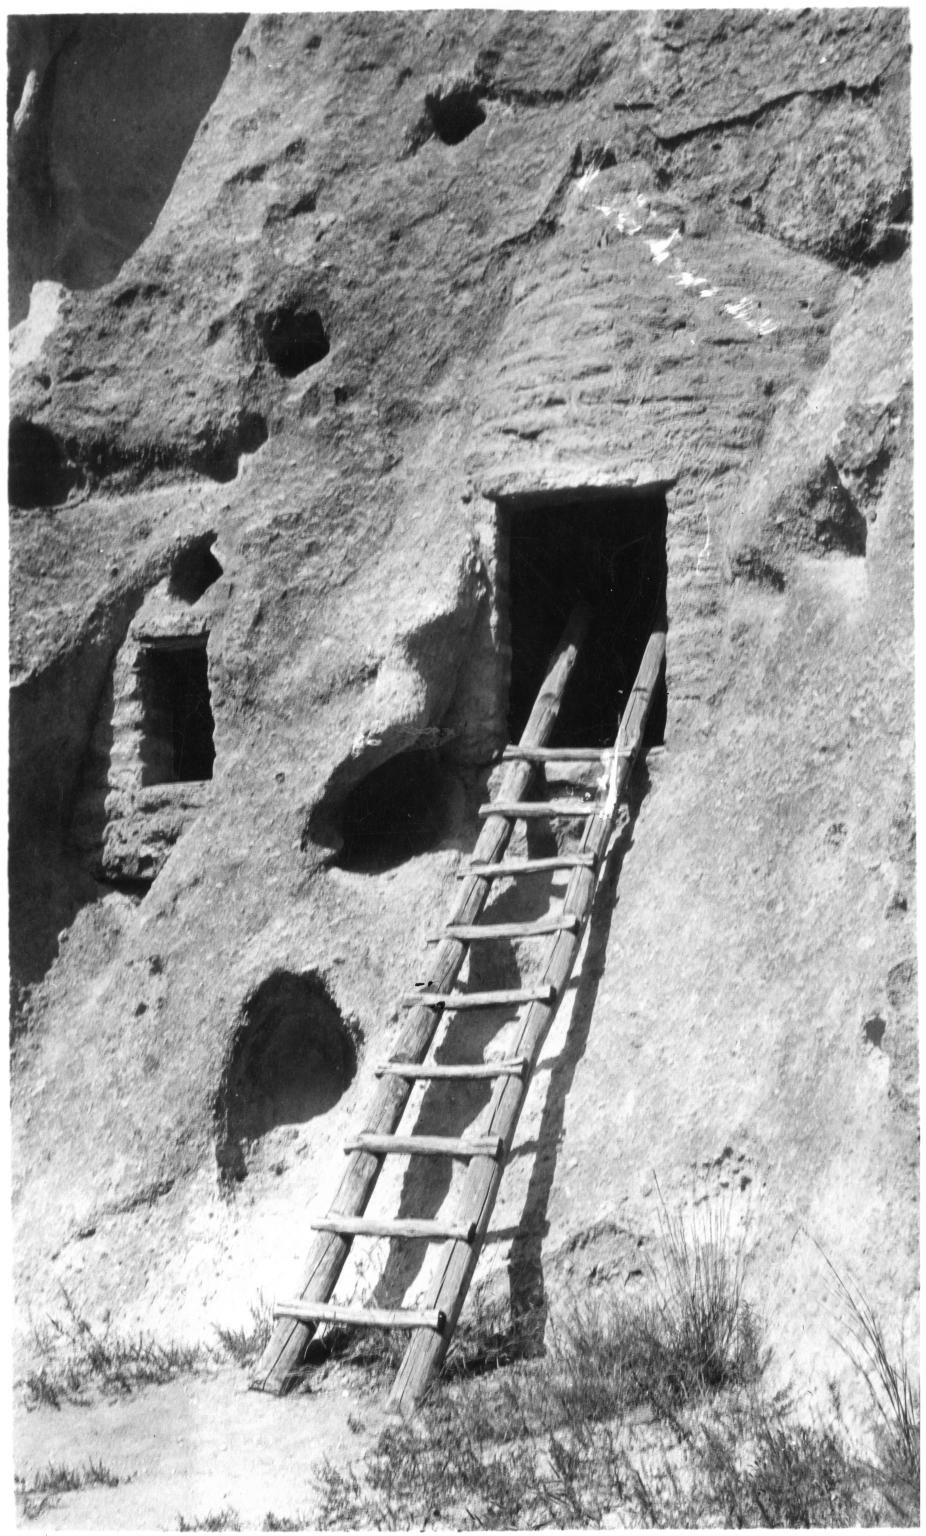 Ruins at Bandelier National Monument